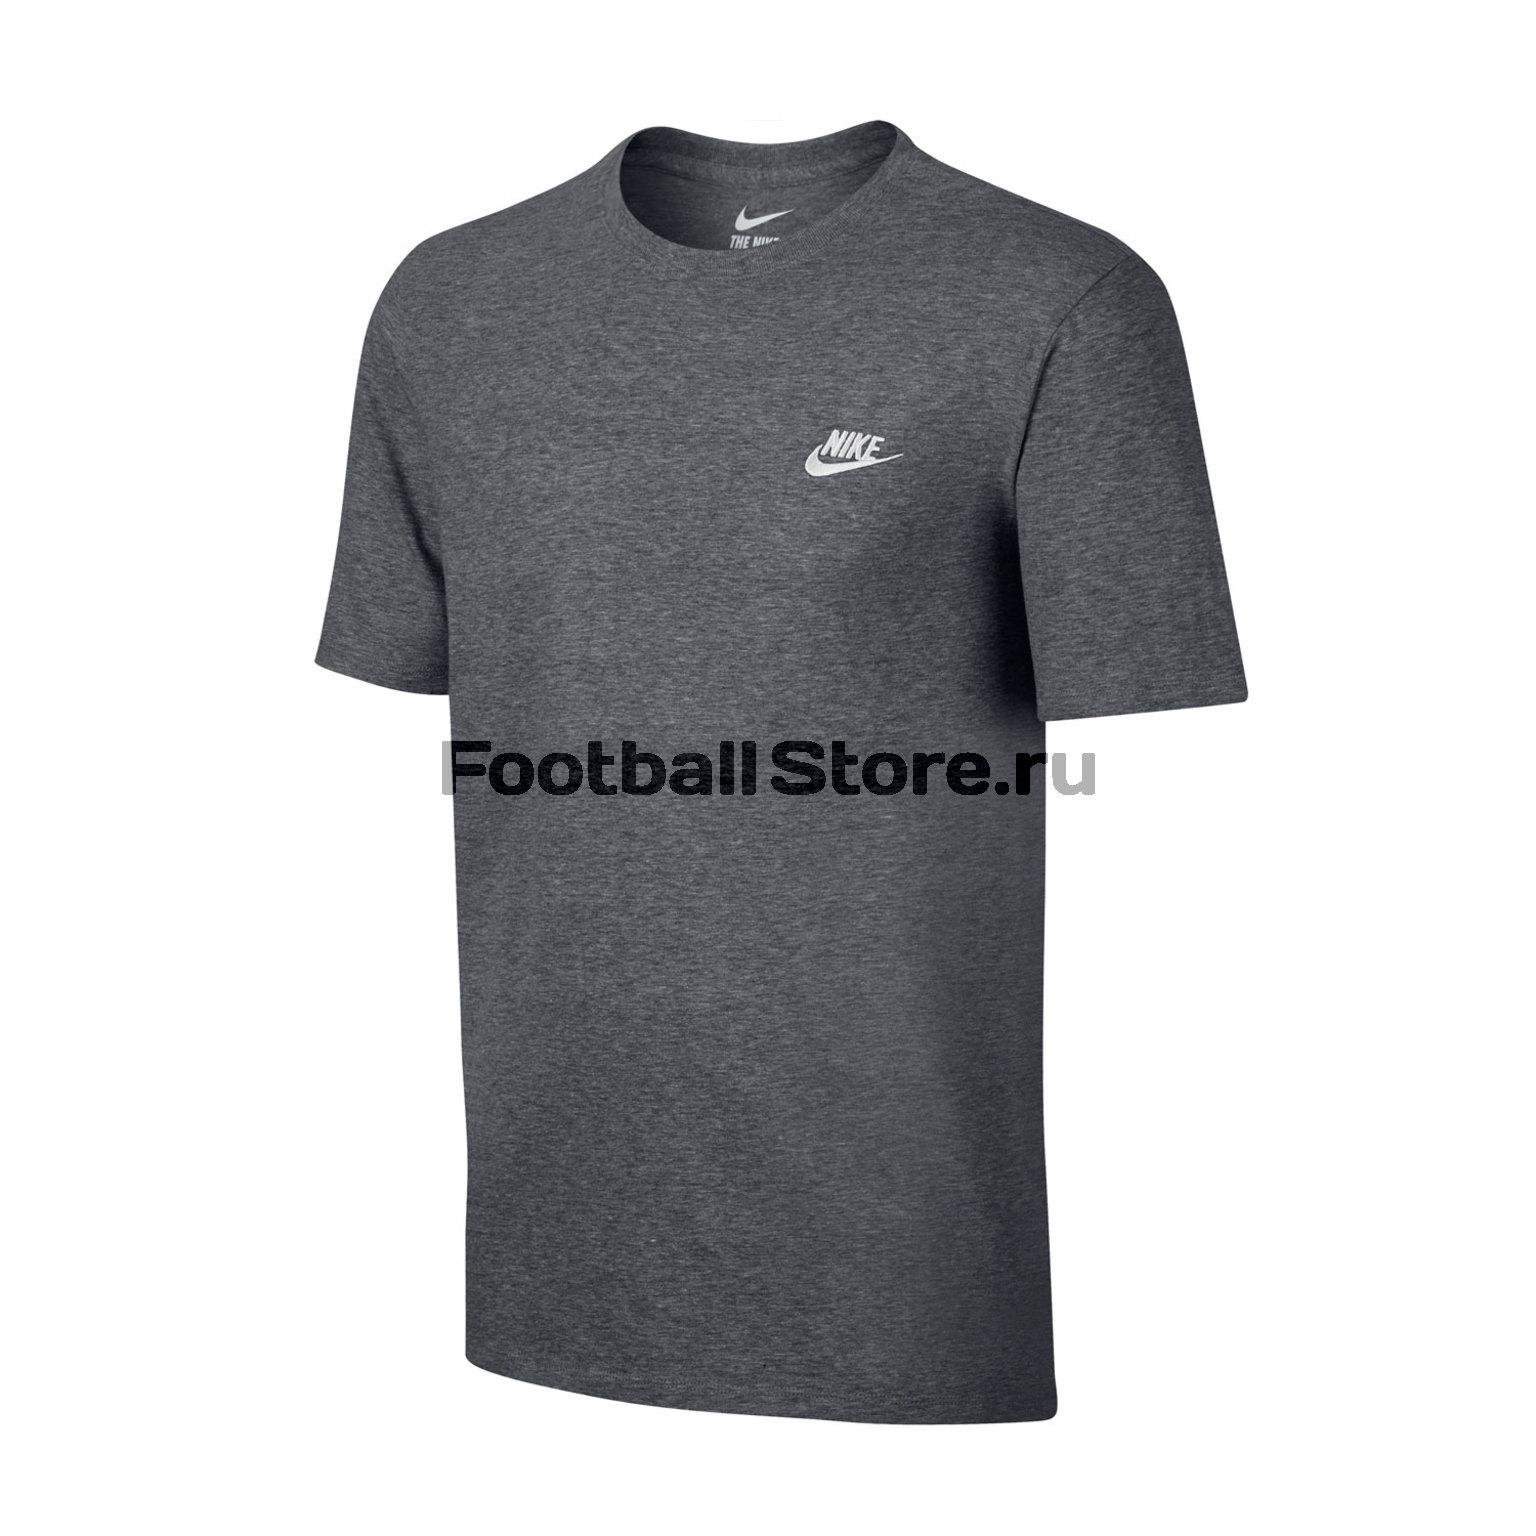 Футболка тренировочная Nike Tee Club Embrd Ftra 827021-091